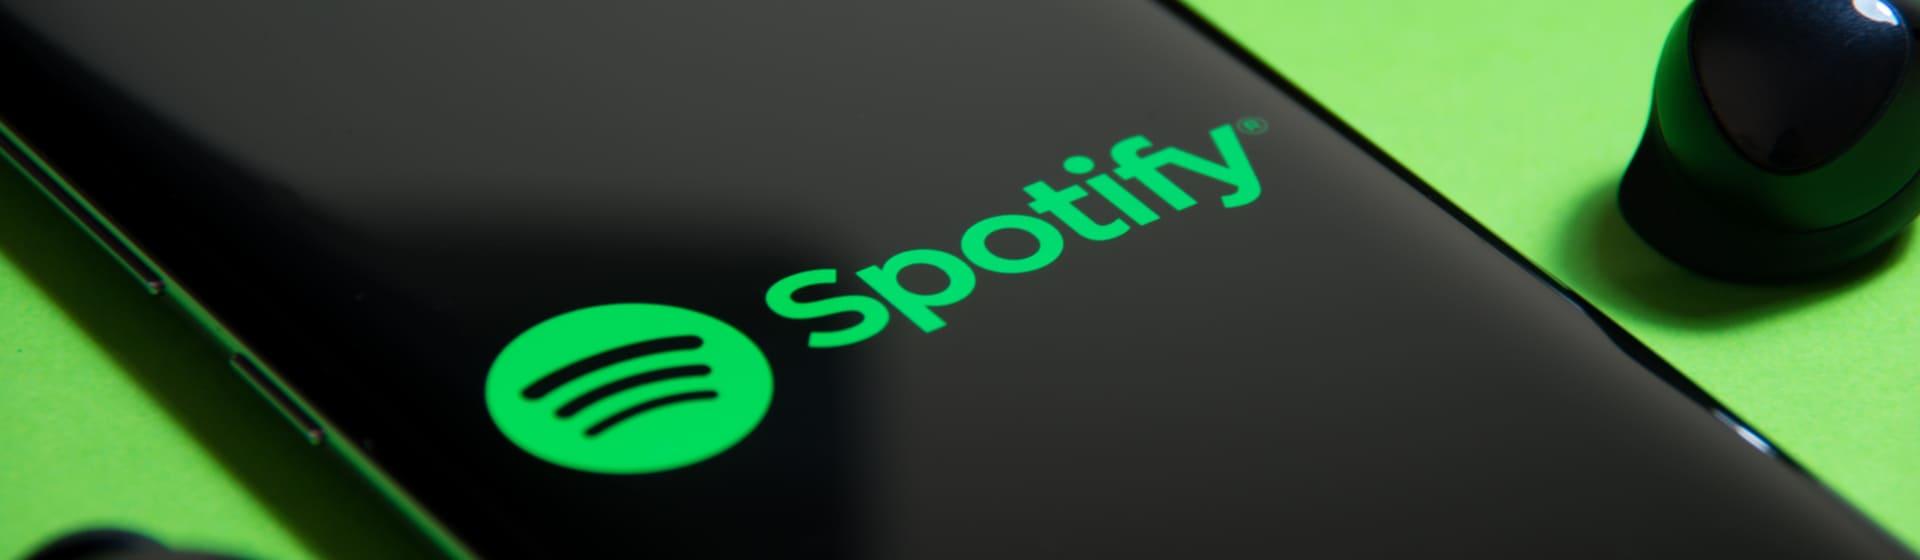 Como baixar Spotify